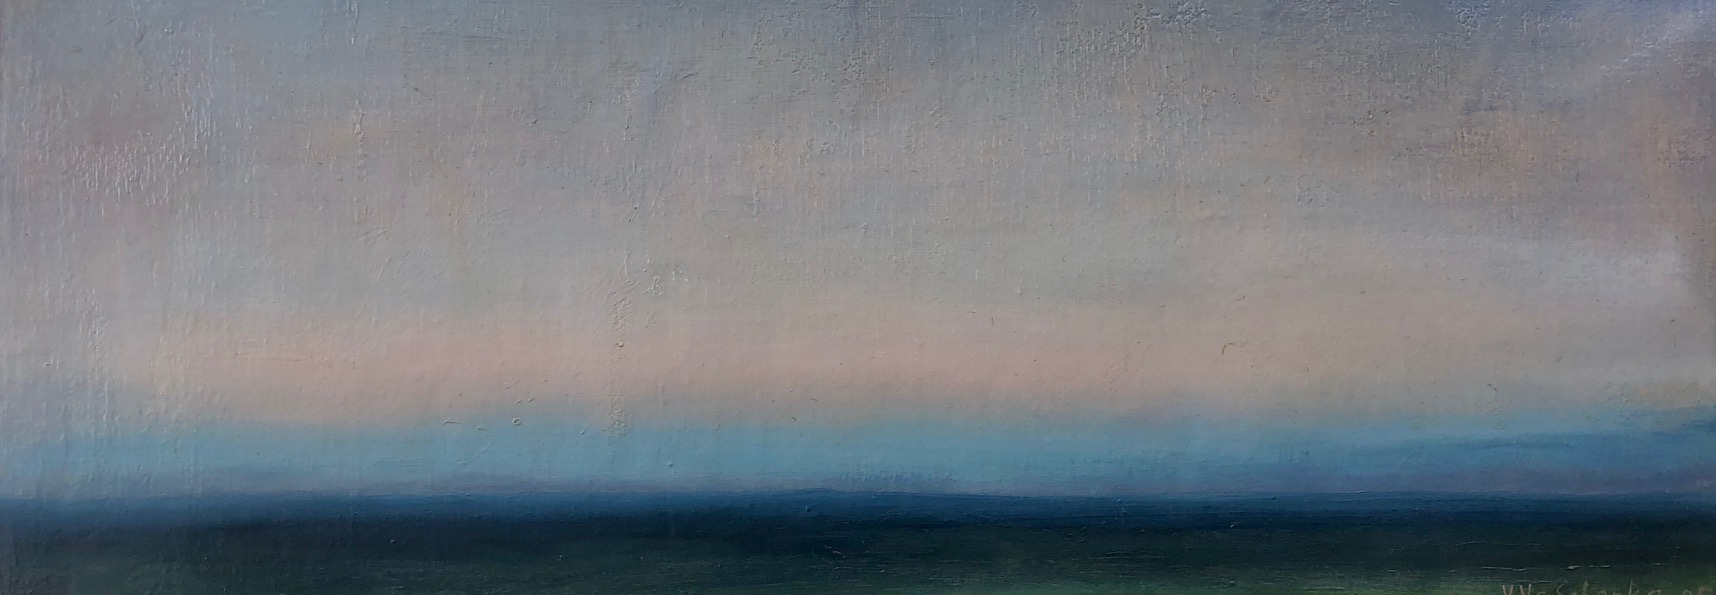 Sun has Set, Twilight #3, 2005  Oil on canvas 7 3/4 x 22 1/2 inches